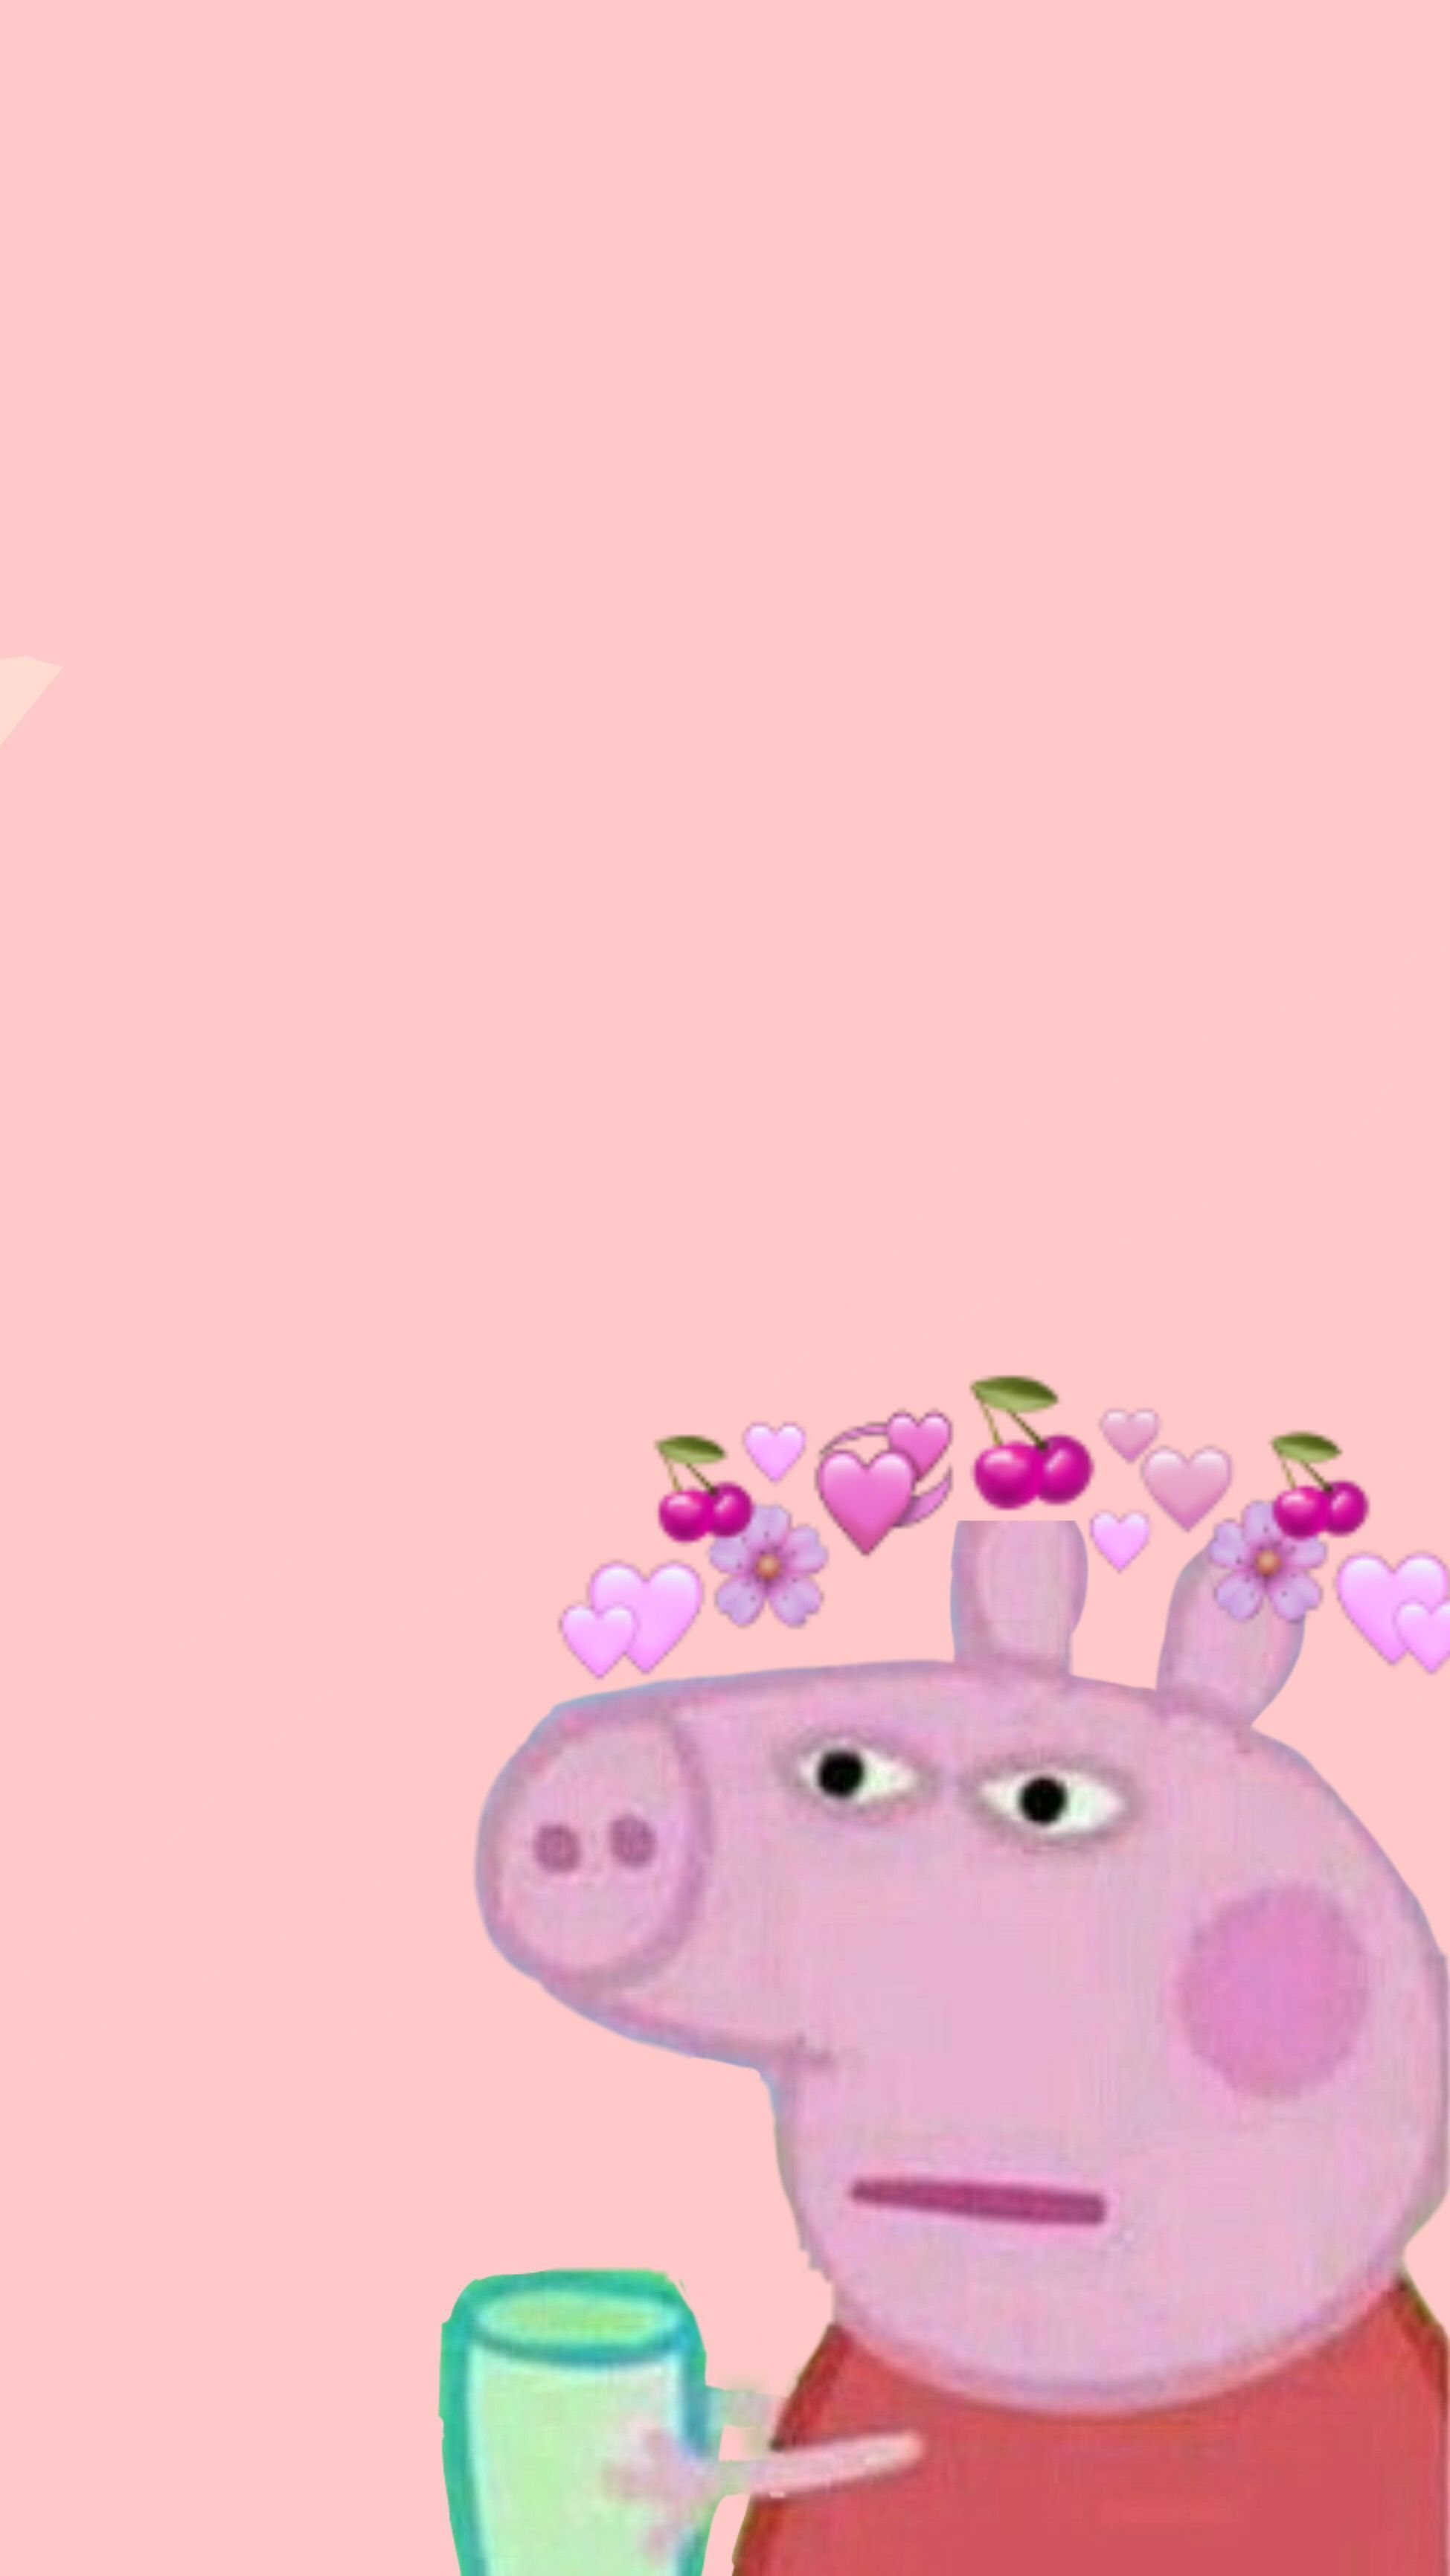 Hermoso Pig Wallpaper Peppa Pig Wallpaper Wallpaper Iphone Cute